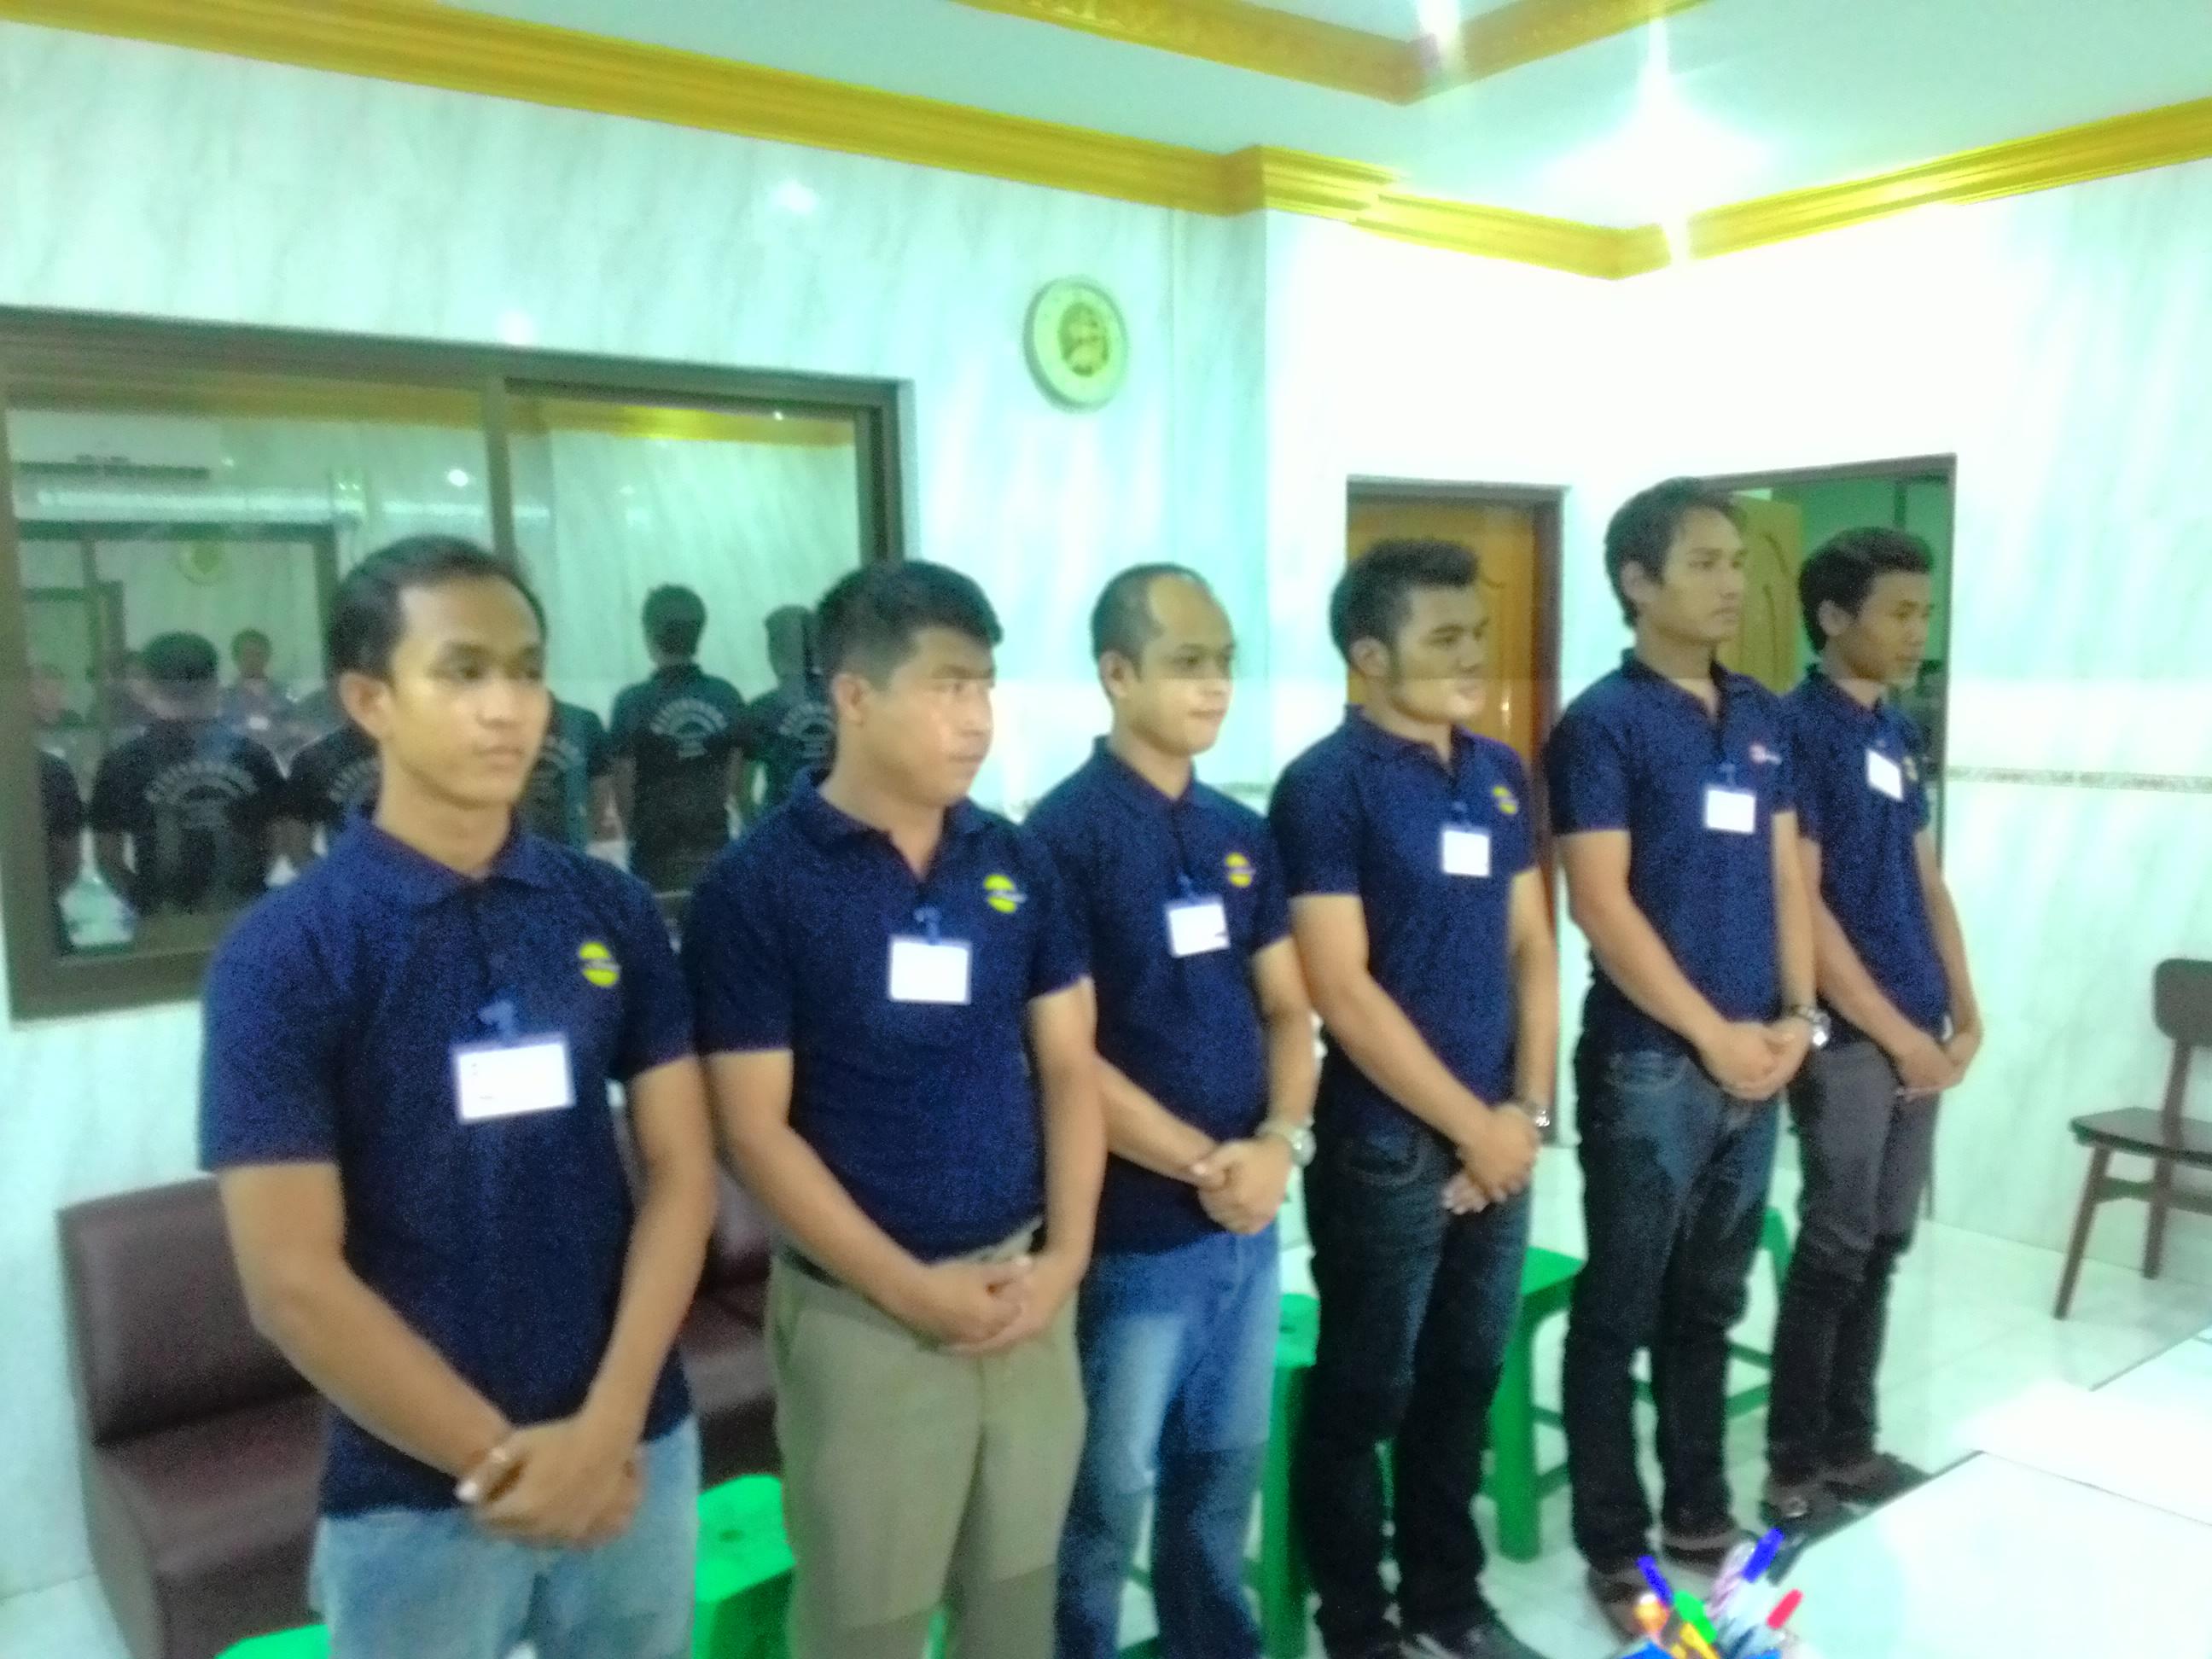 ミャンマー技能実習生採用面接、建設建築編